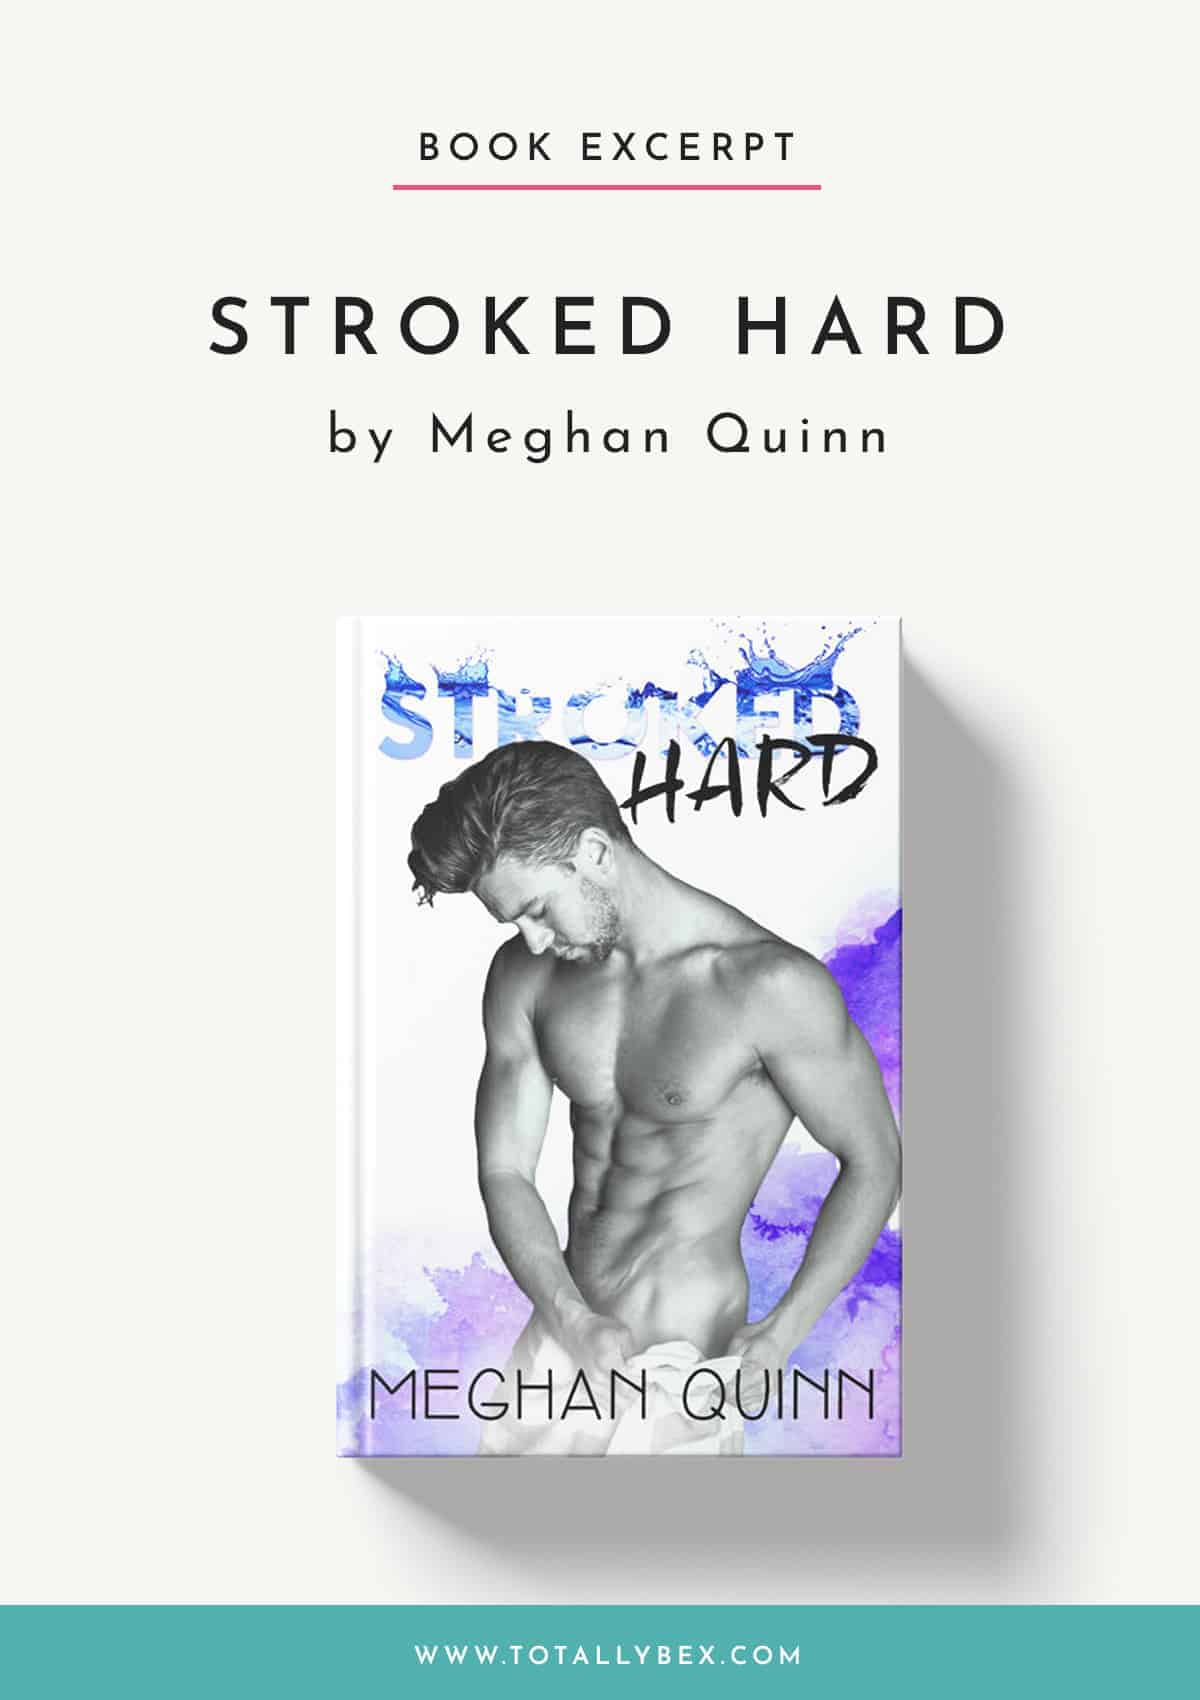 Stroked Hard by Meghan Quinn-Excerpt